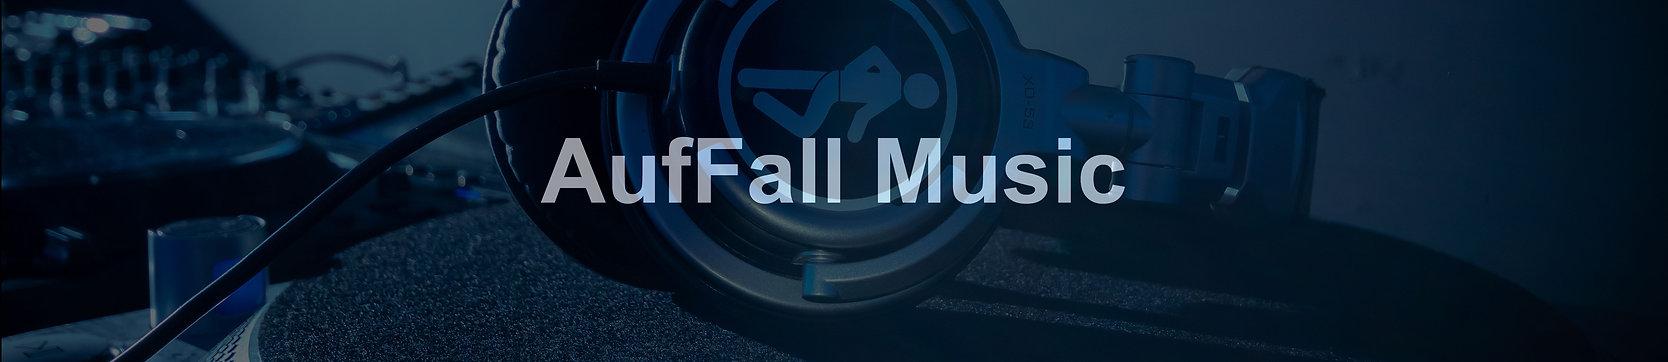 AufFall-Music.jpg